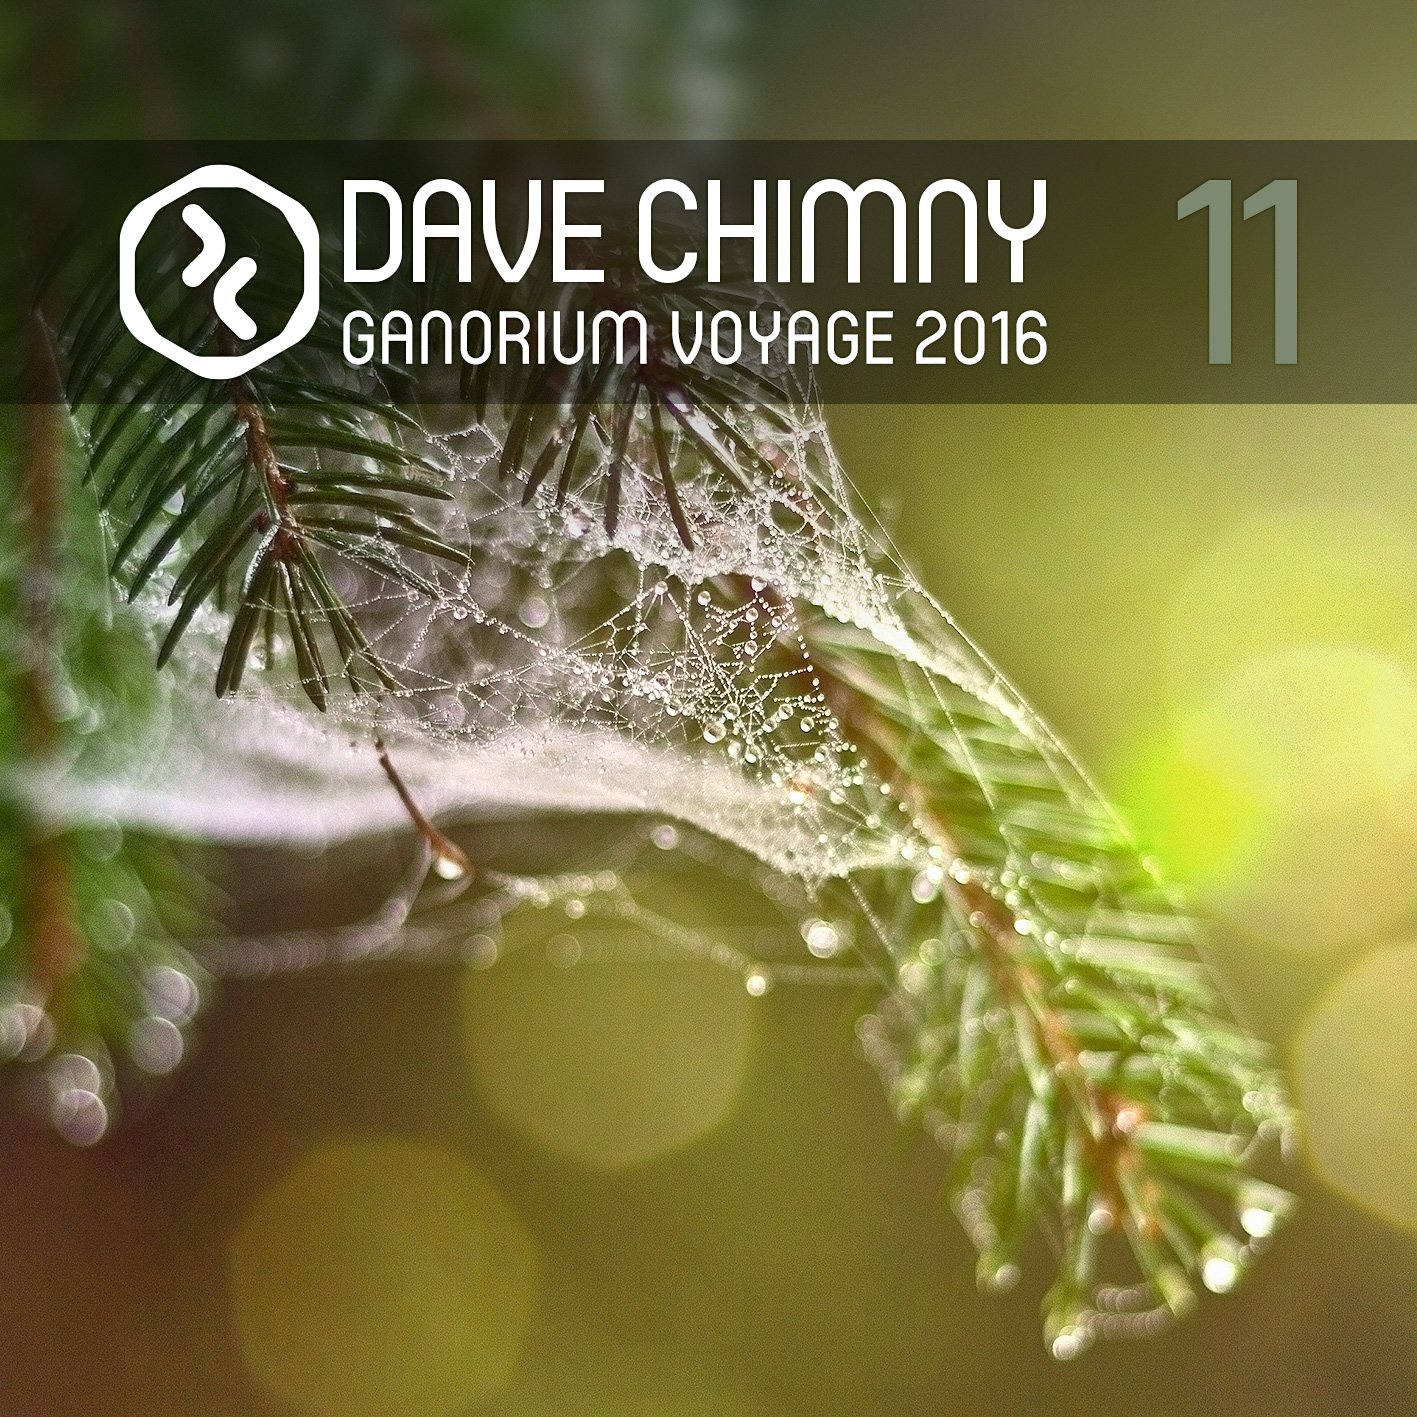 Dave Chimny – Ganorium Voyage 2016-11